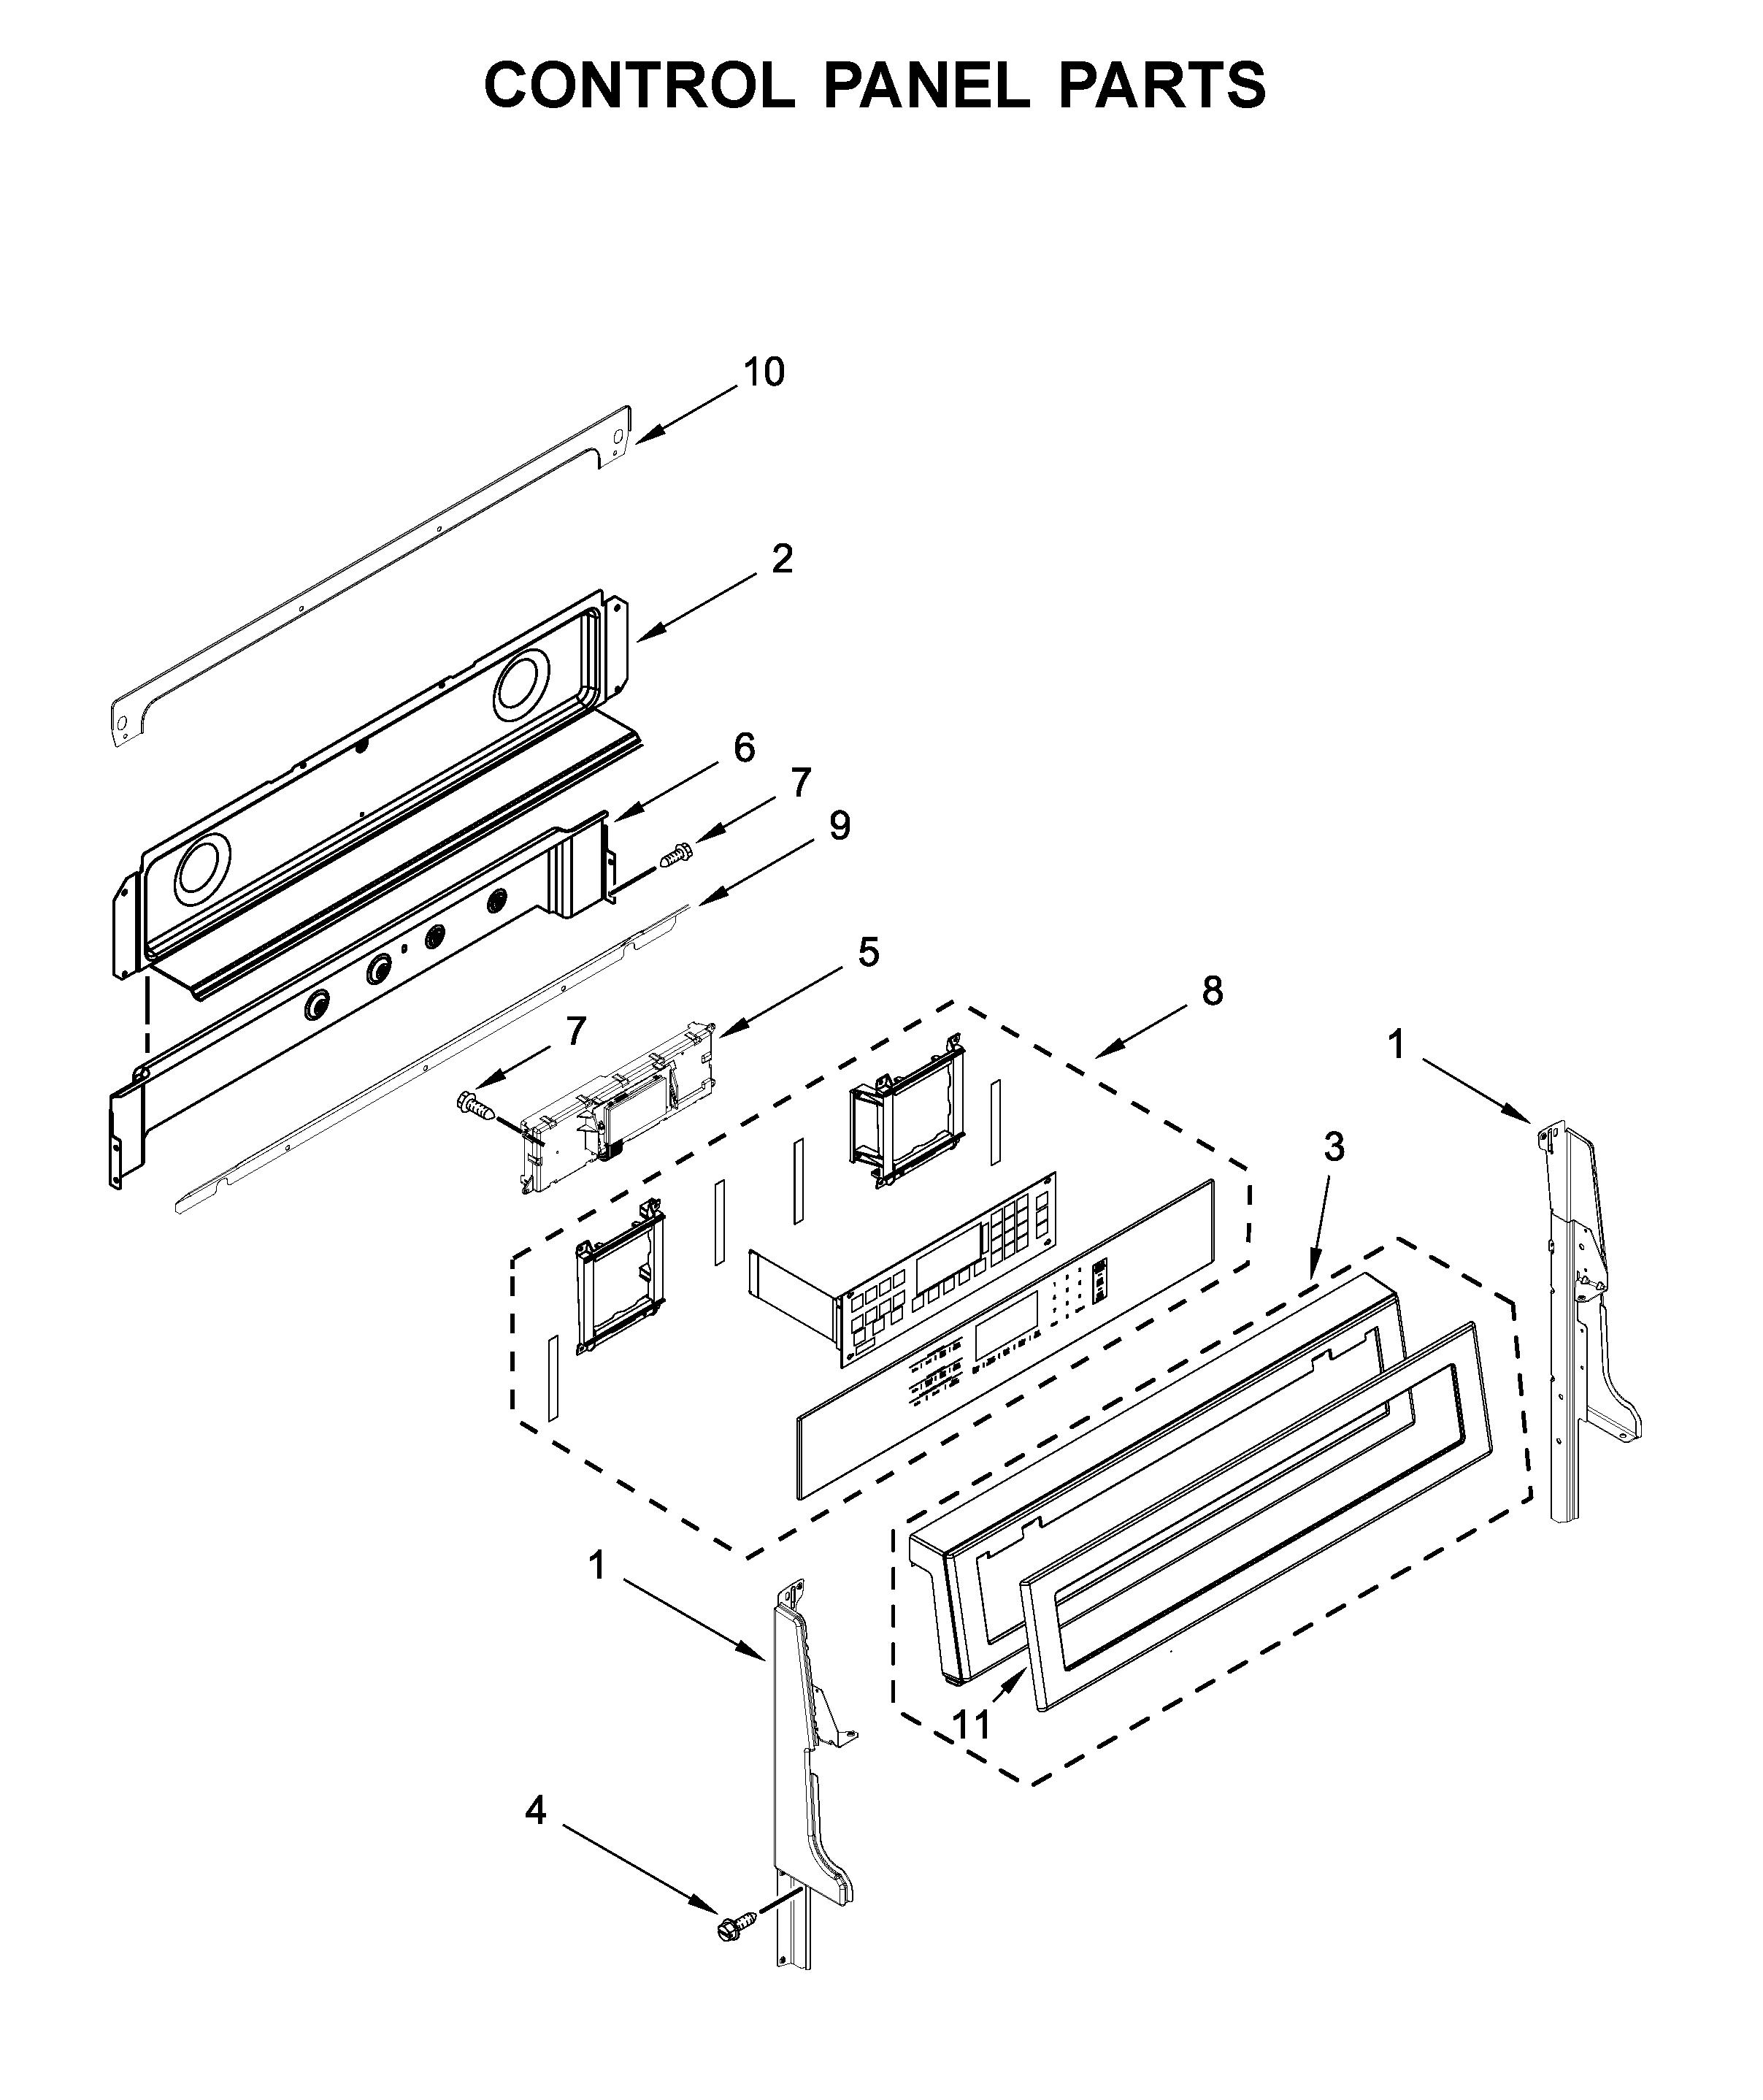 Kitchenaid  Electric Range  Control panel parts